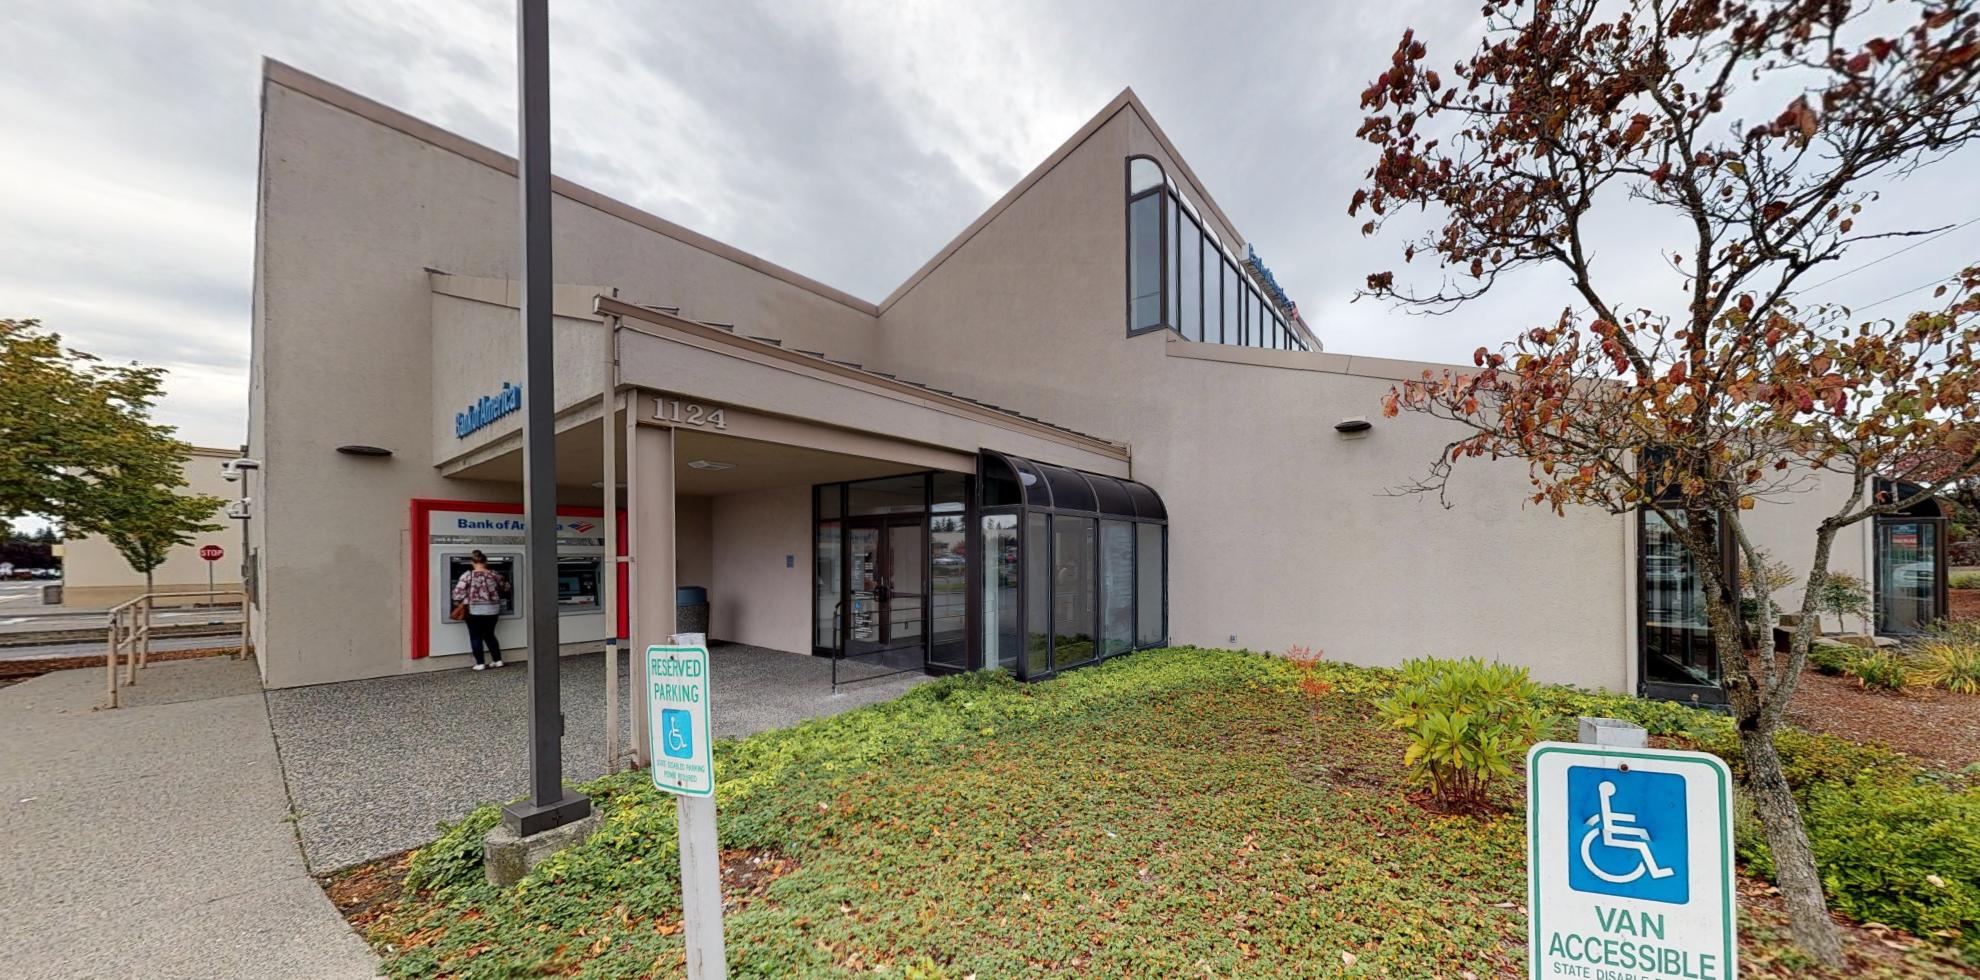 Bank of America financial center with walk-up ATM   1124 SE Everett Mall Way, Everett, WA 98208